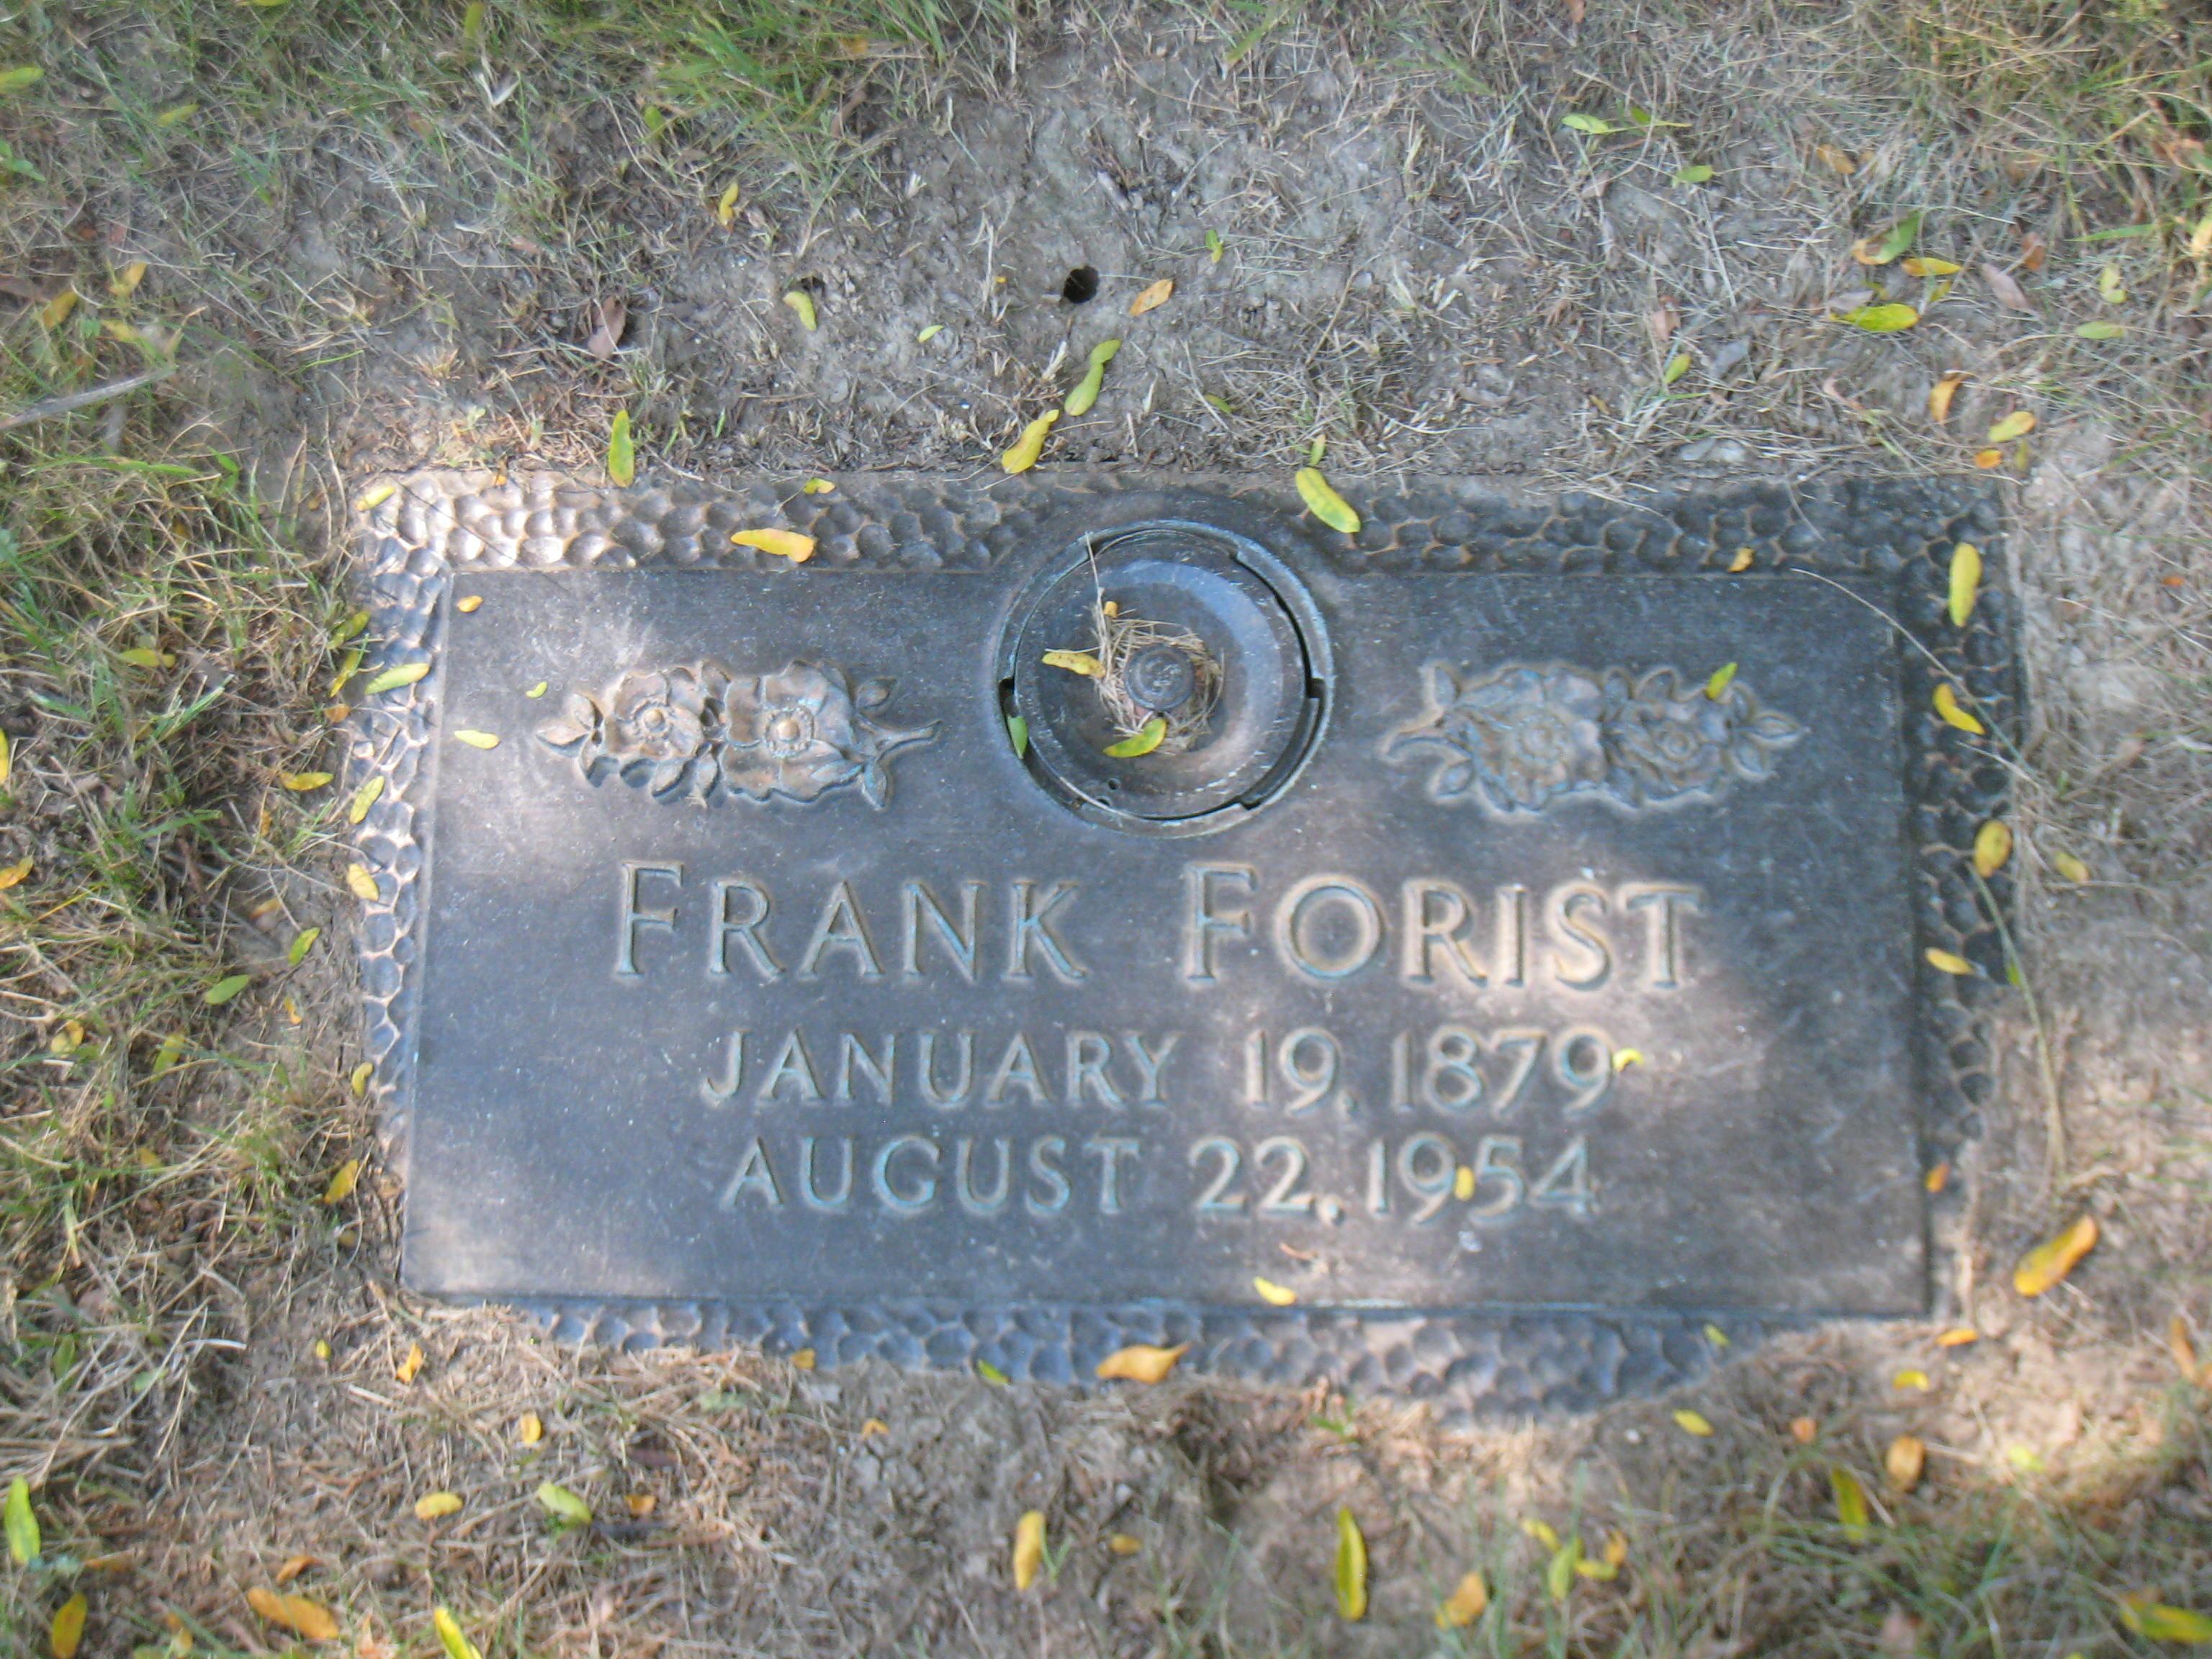 Frank Forist